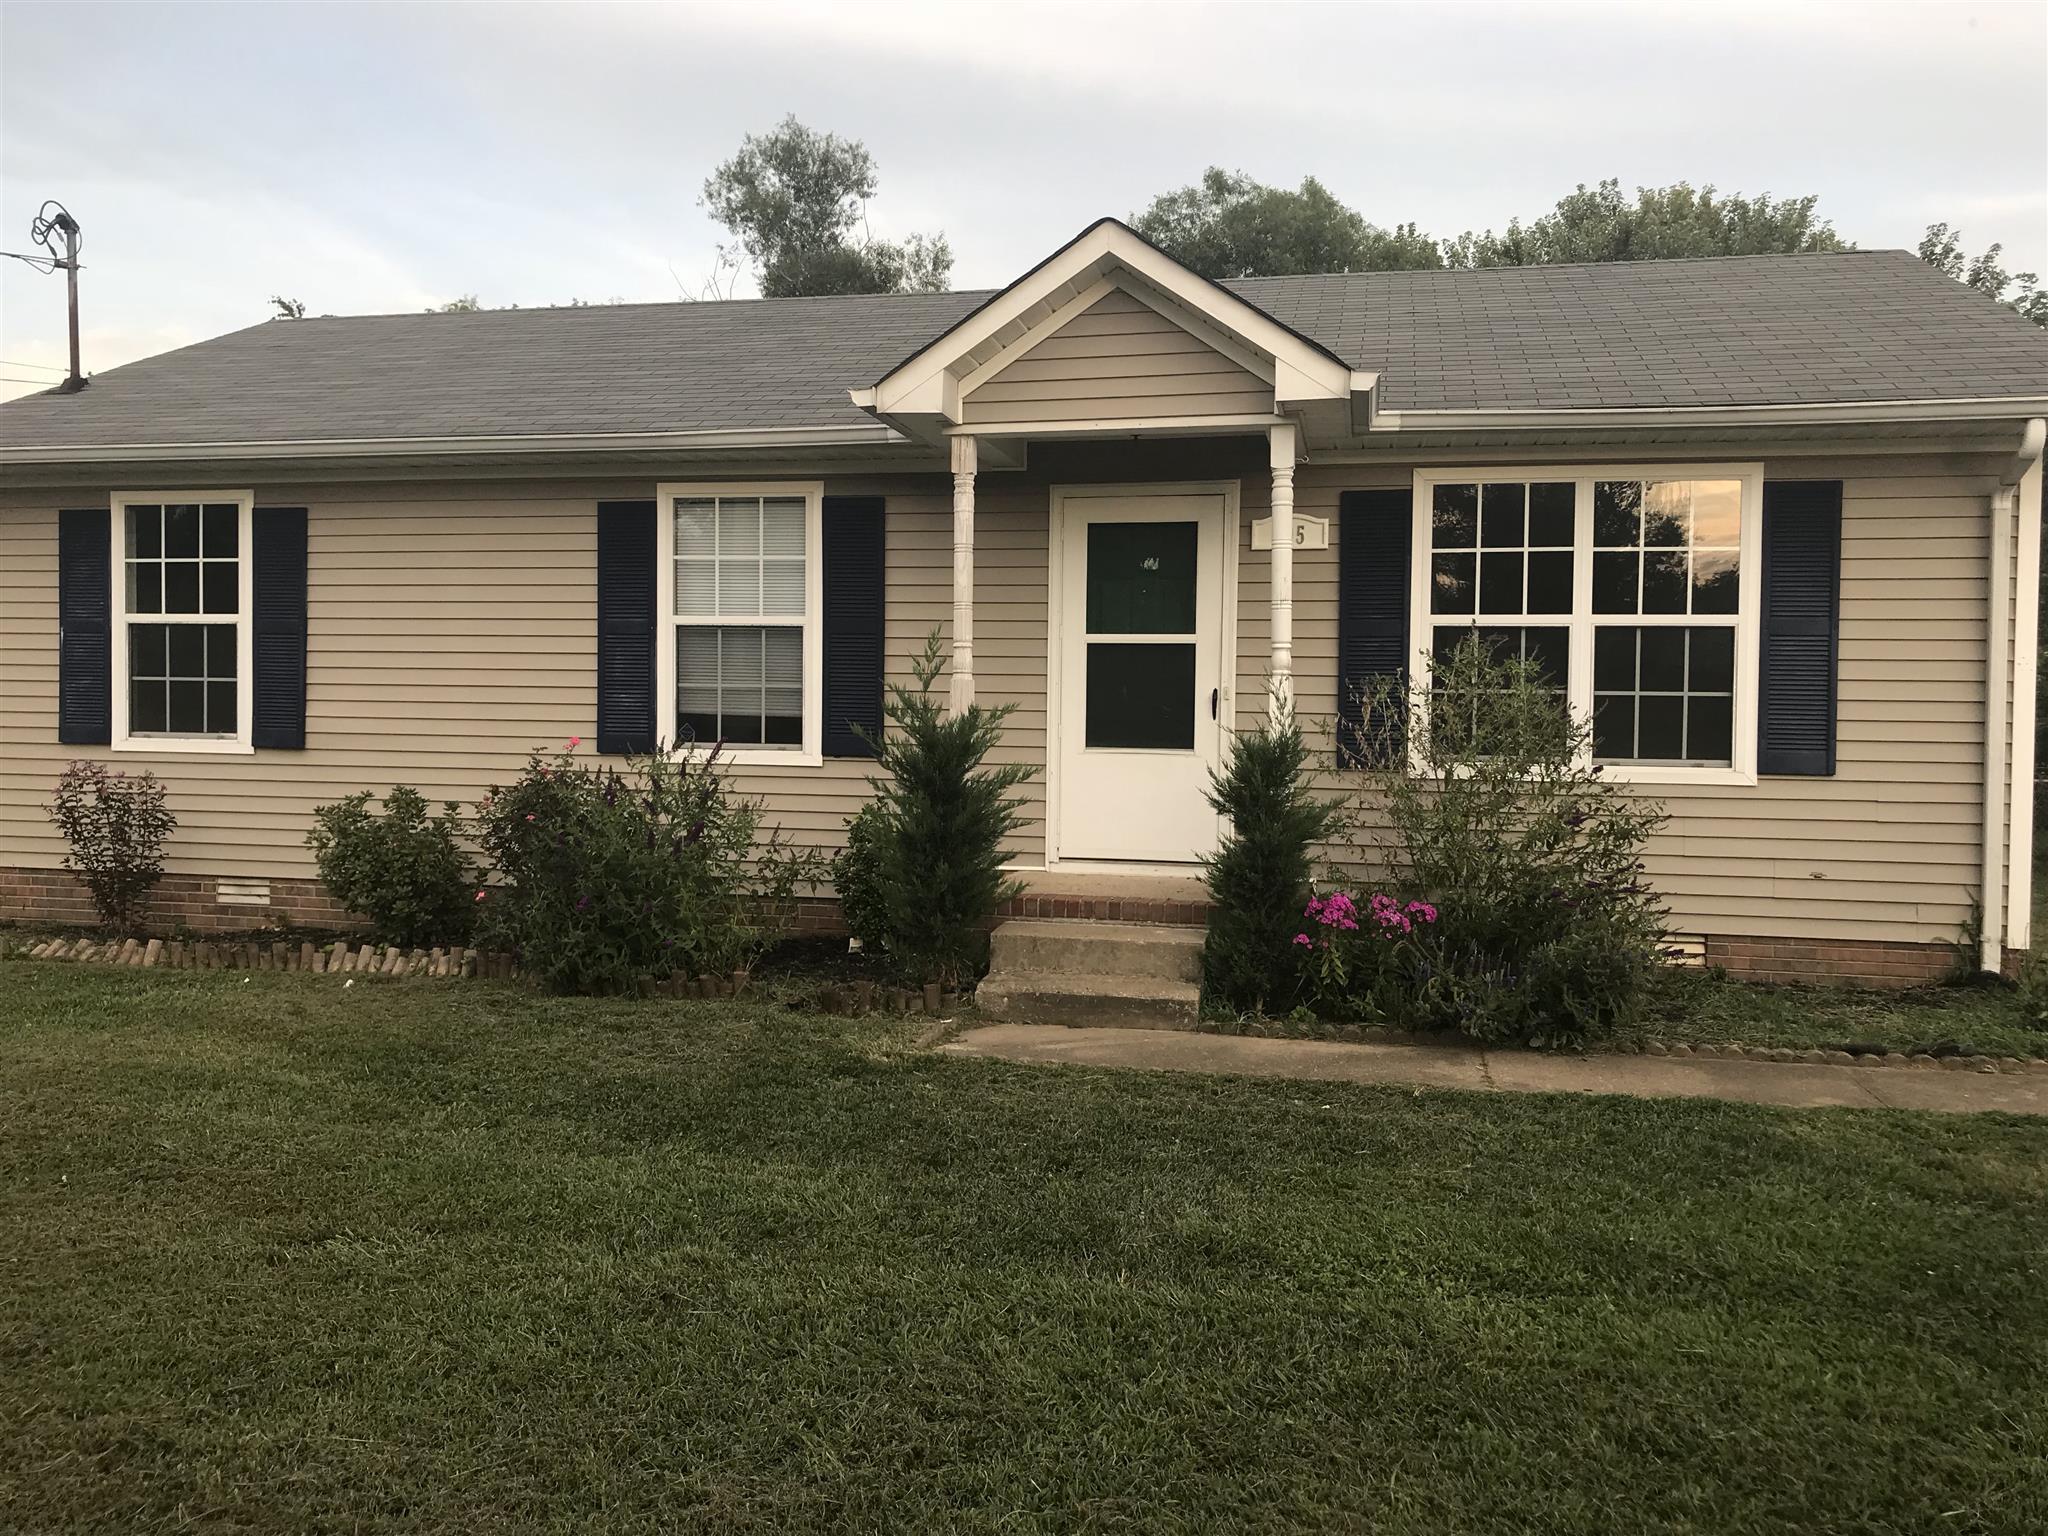 805 Washington Ave, Oak Grove, KY 42262 - Oak Grove, KY real estate listing